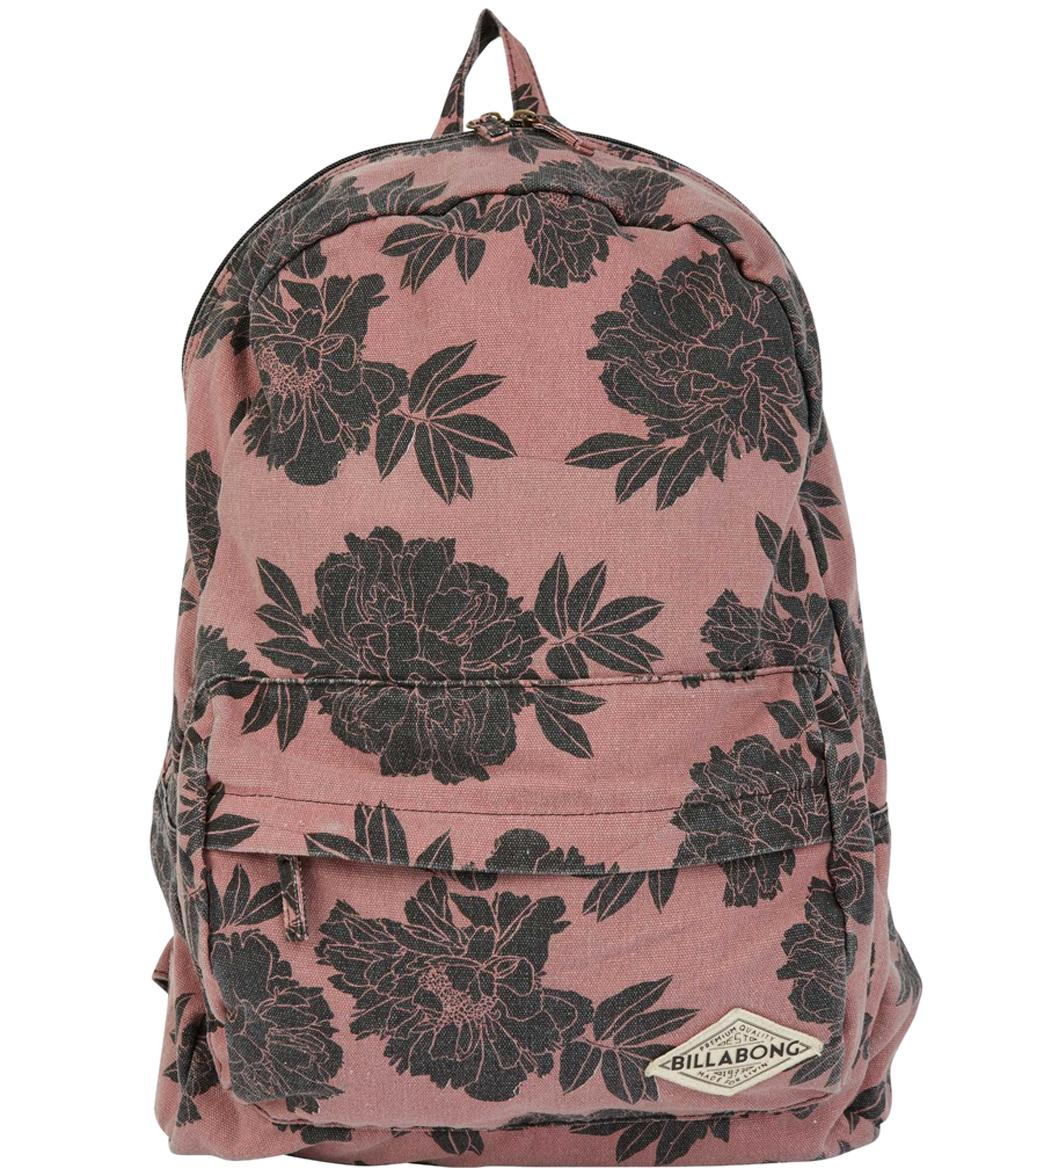 d988d08db Billabong Hand Over Love Canvas Backpack at SwimOutlet.com